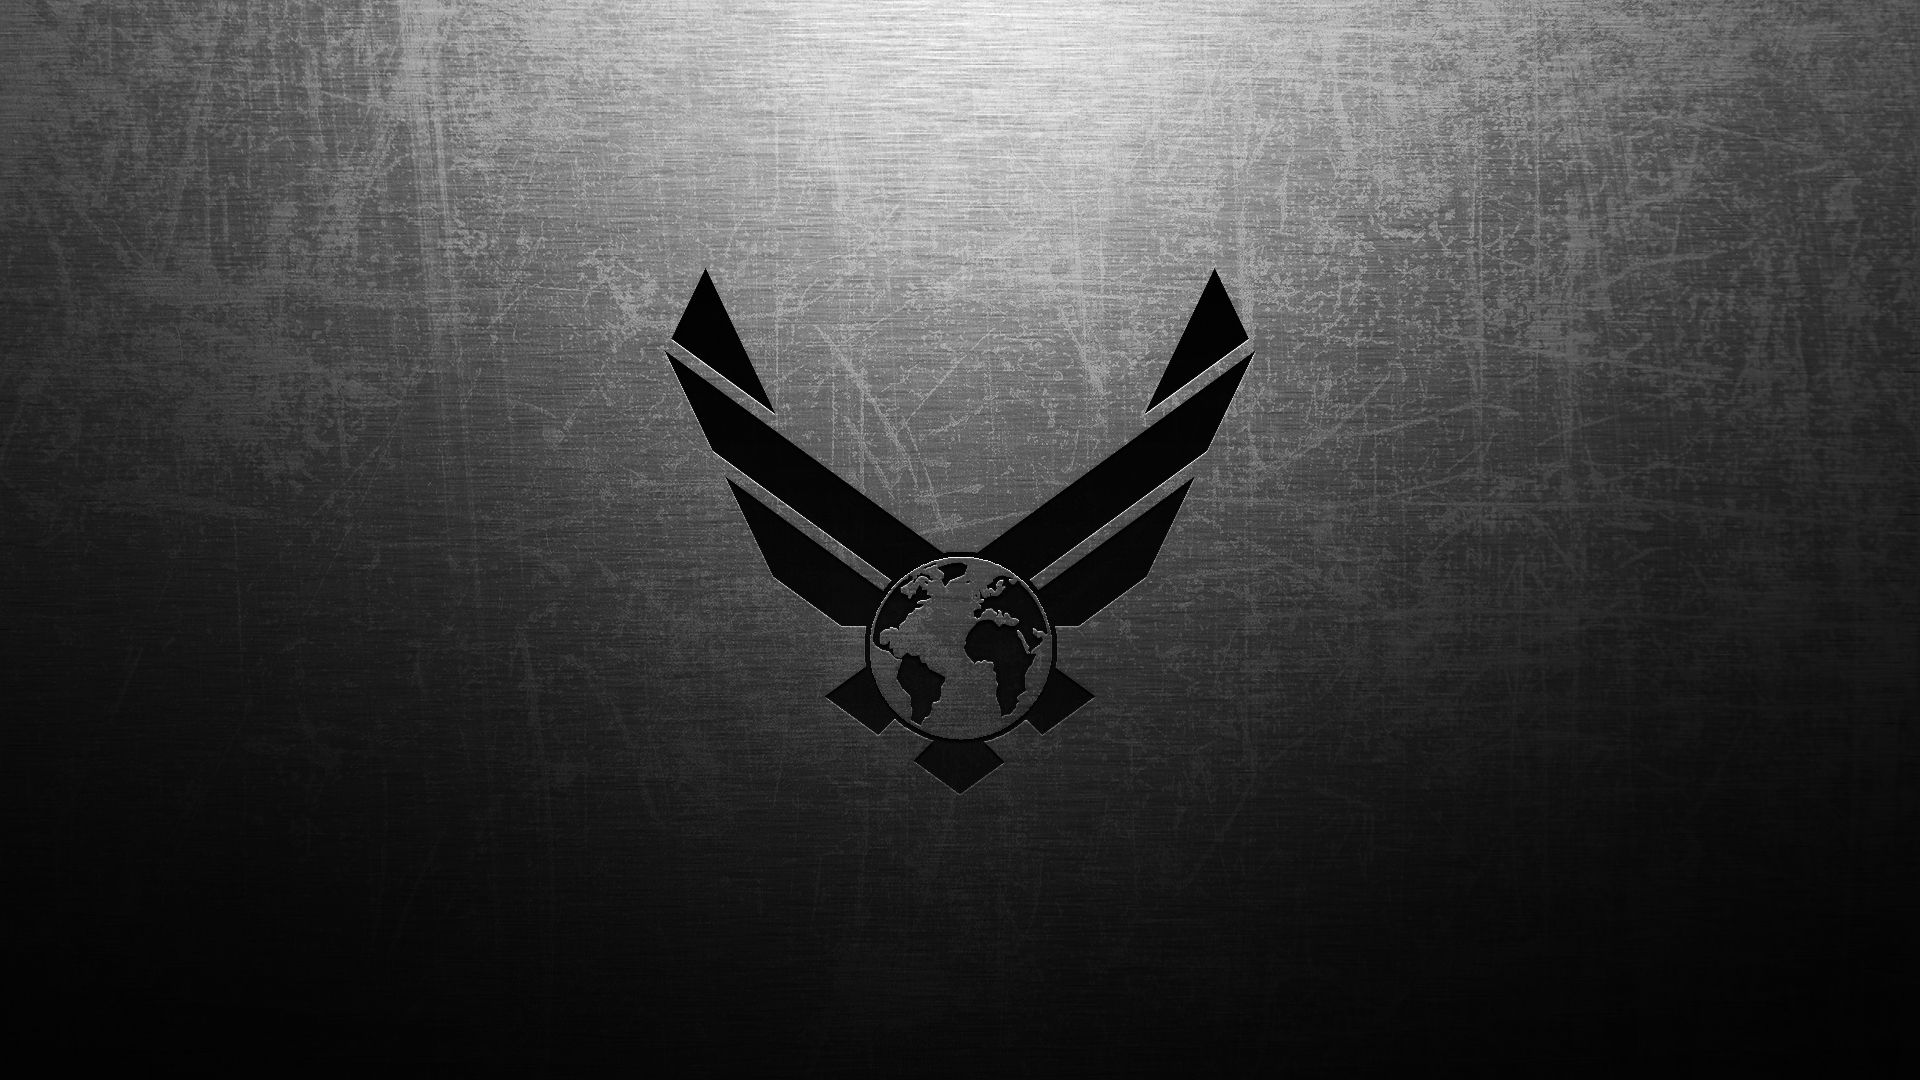 Us Air Force Logo Wallpaper 1274592 Go Wallpaper Air Force Wallpaper Air Force